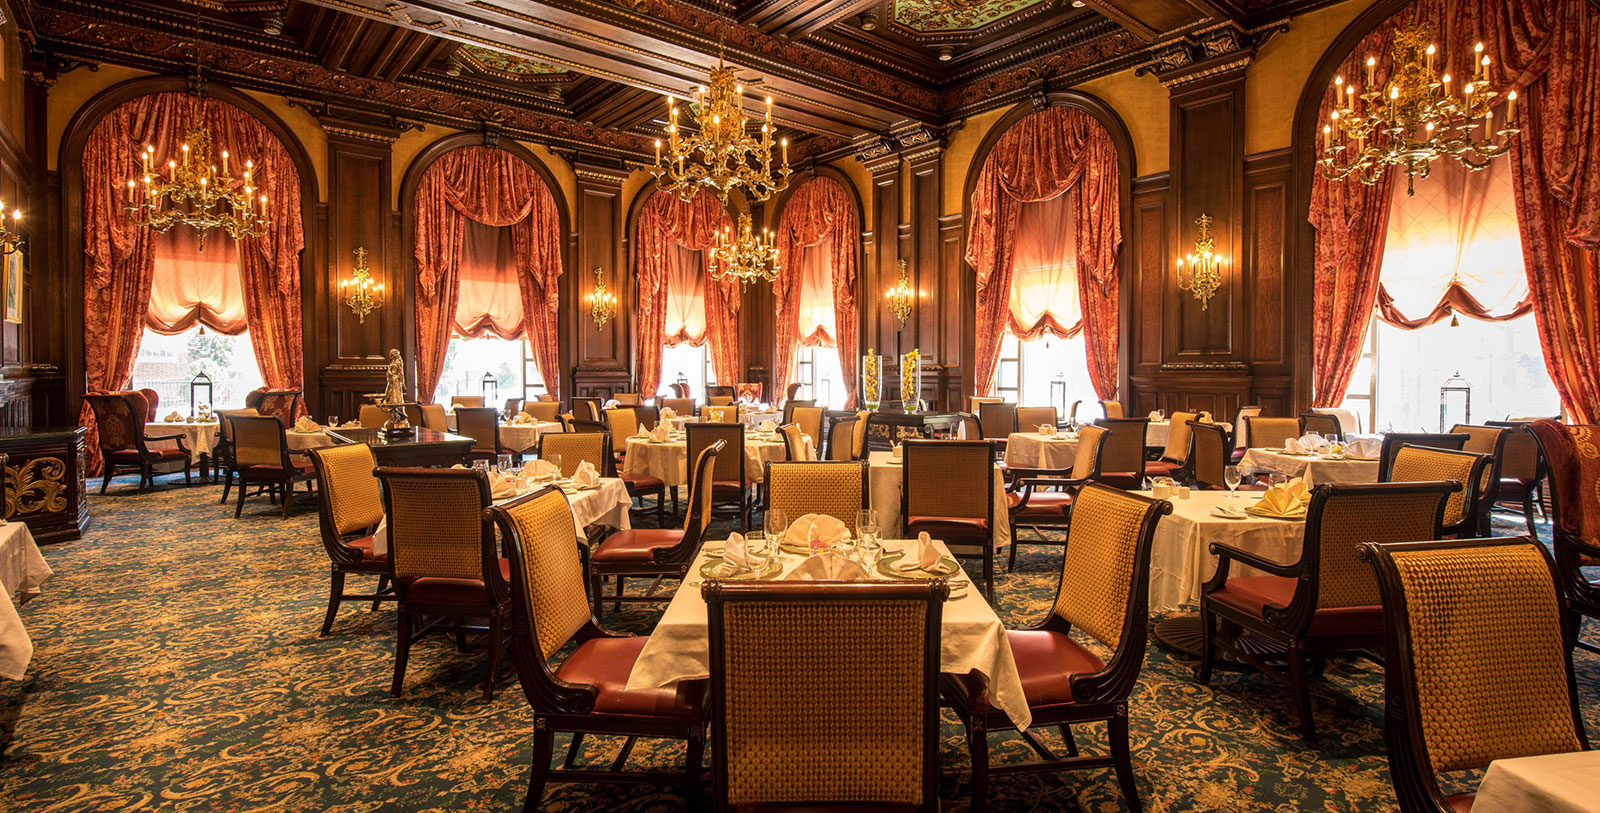 Image of Green room dining room HOTEL DU PONT, 1913, Member of Historic Hotels of America, in Wilmington, Delaware, Taste